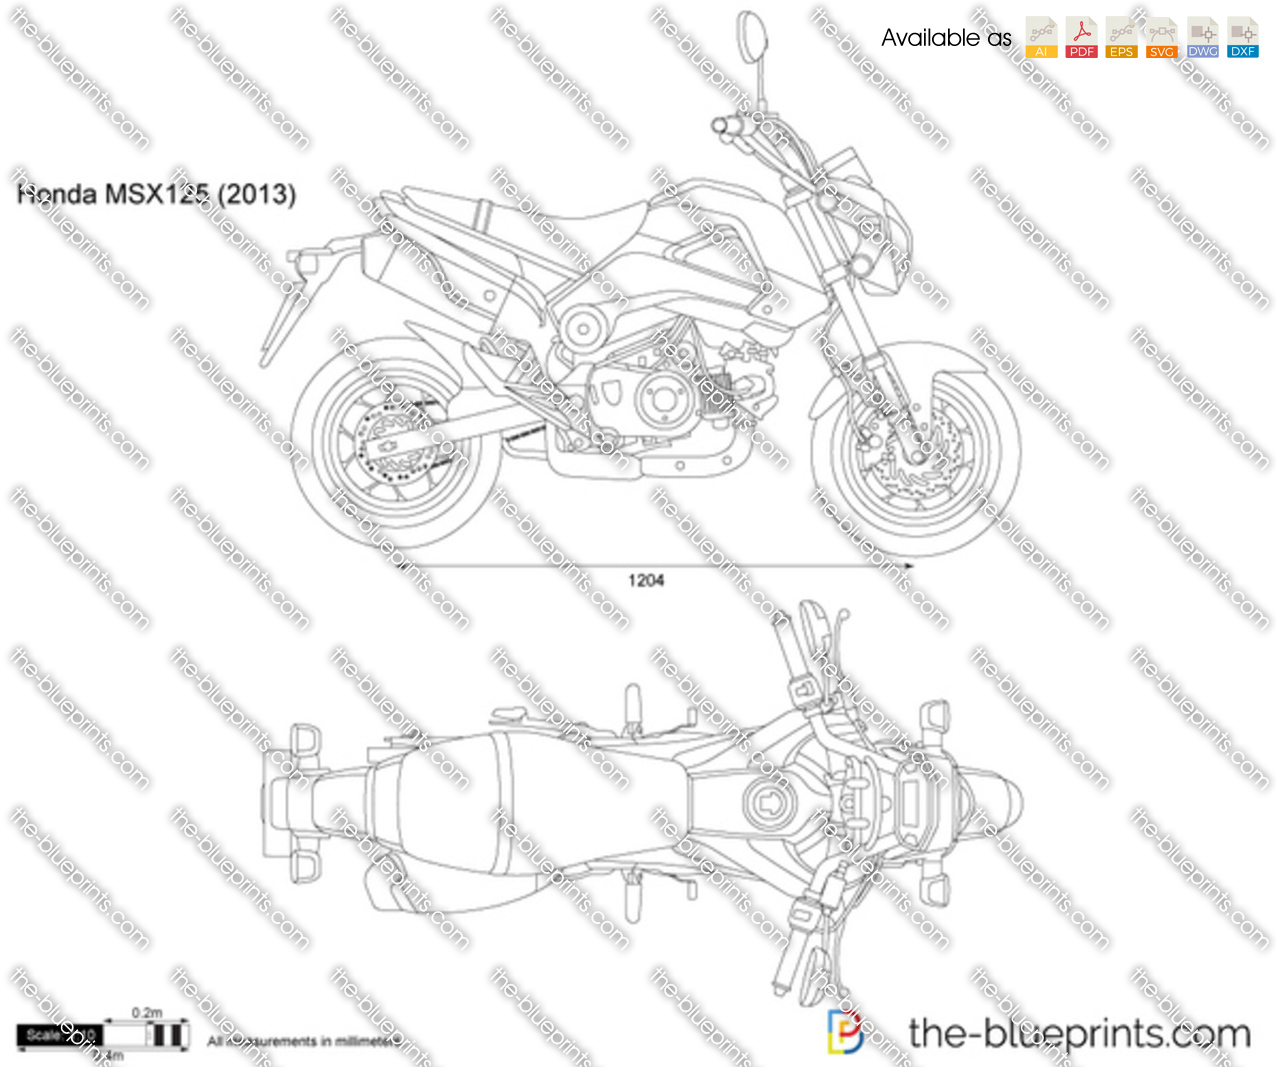 Honda MSX125 2015